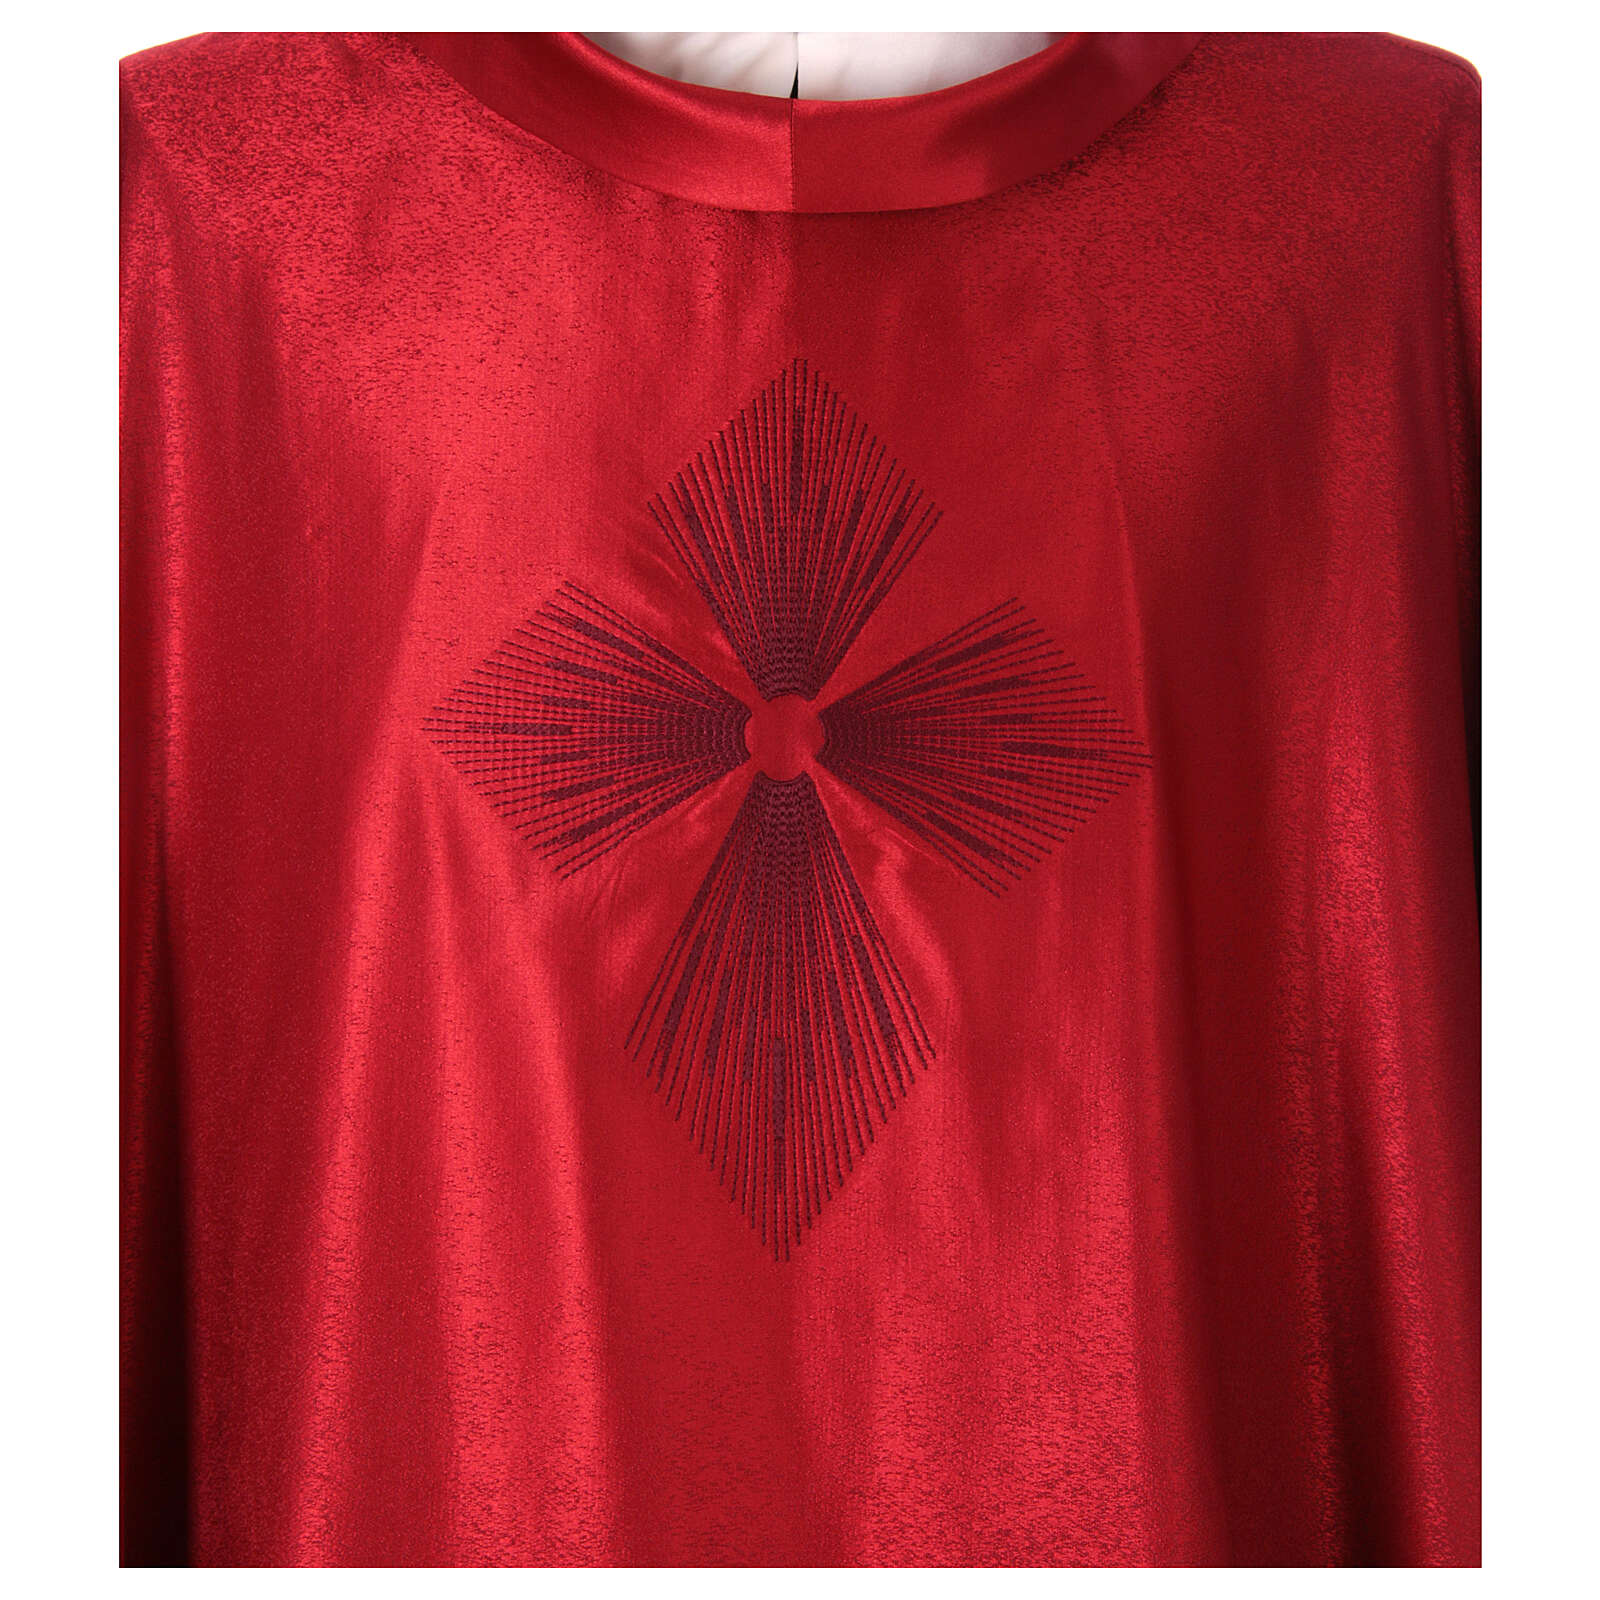 STOCK Casula gradiente lã seda levíssima cruz bordada 4